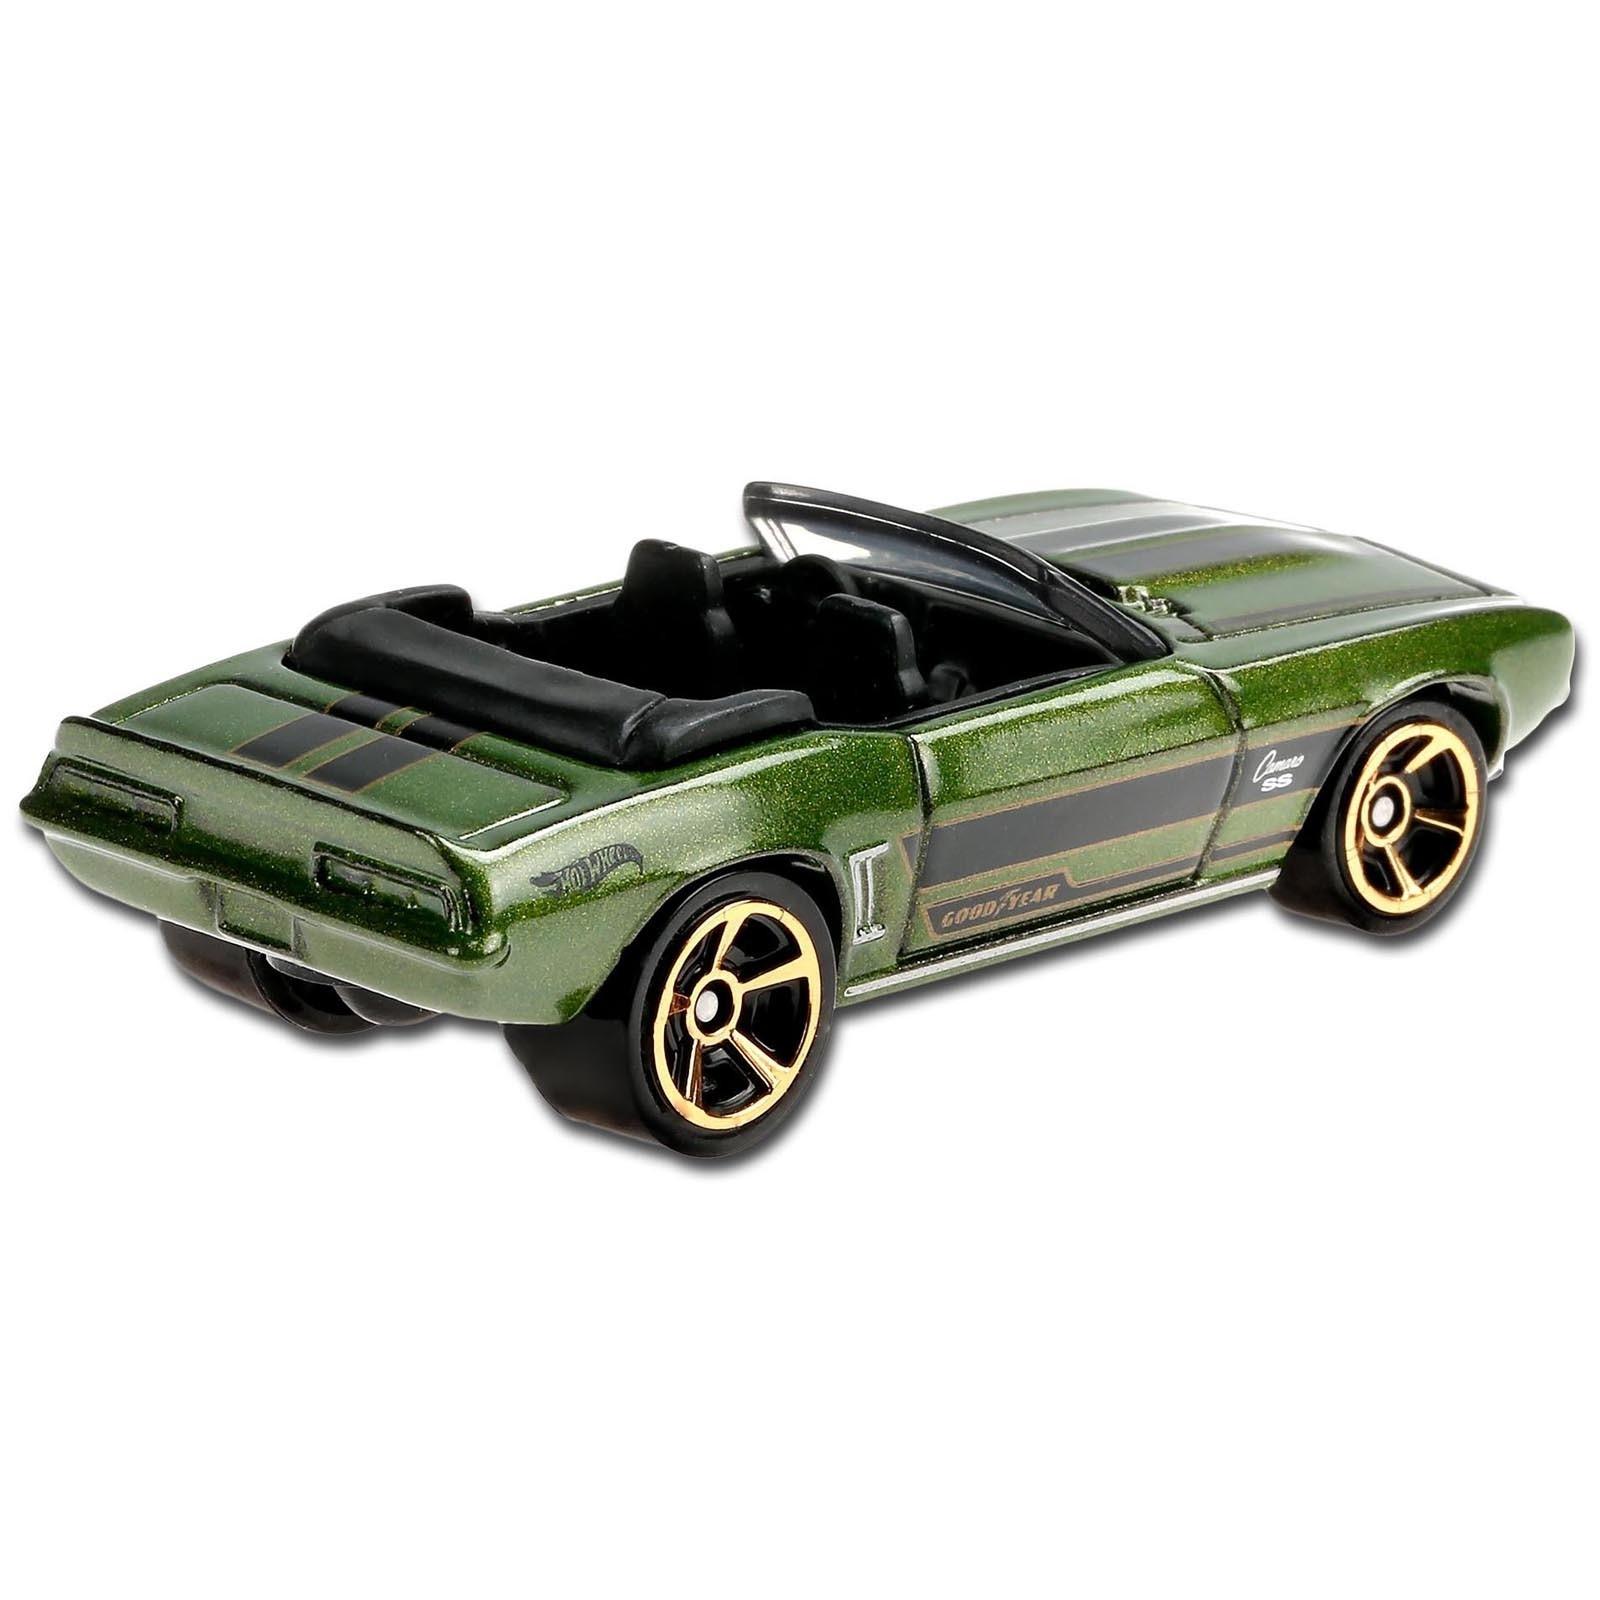 Carrinho Hot Wheels 69 Camaro (HGSIL) HW Roadsters - Mattel